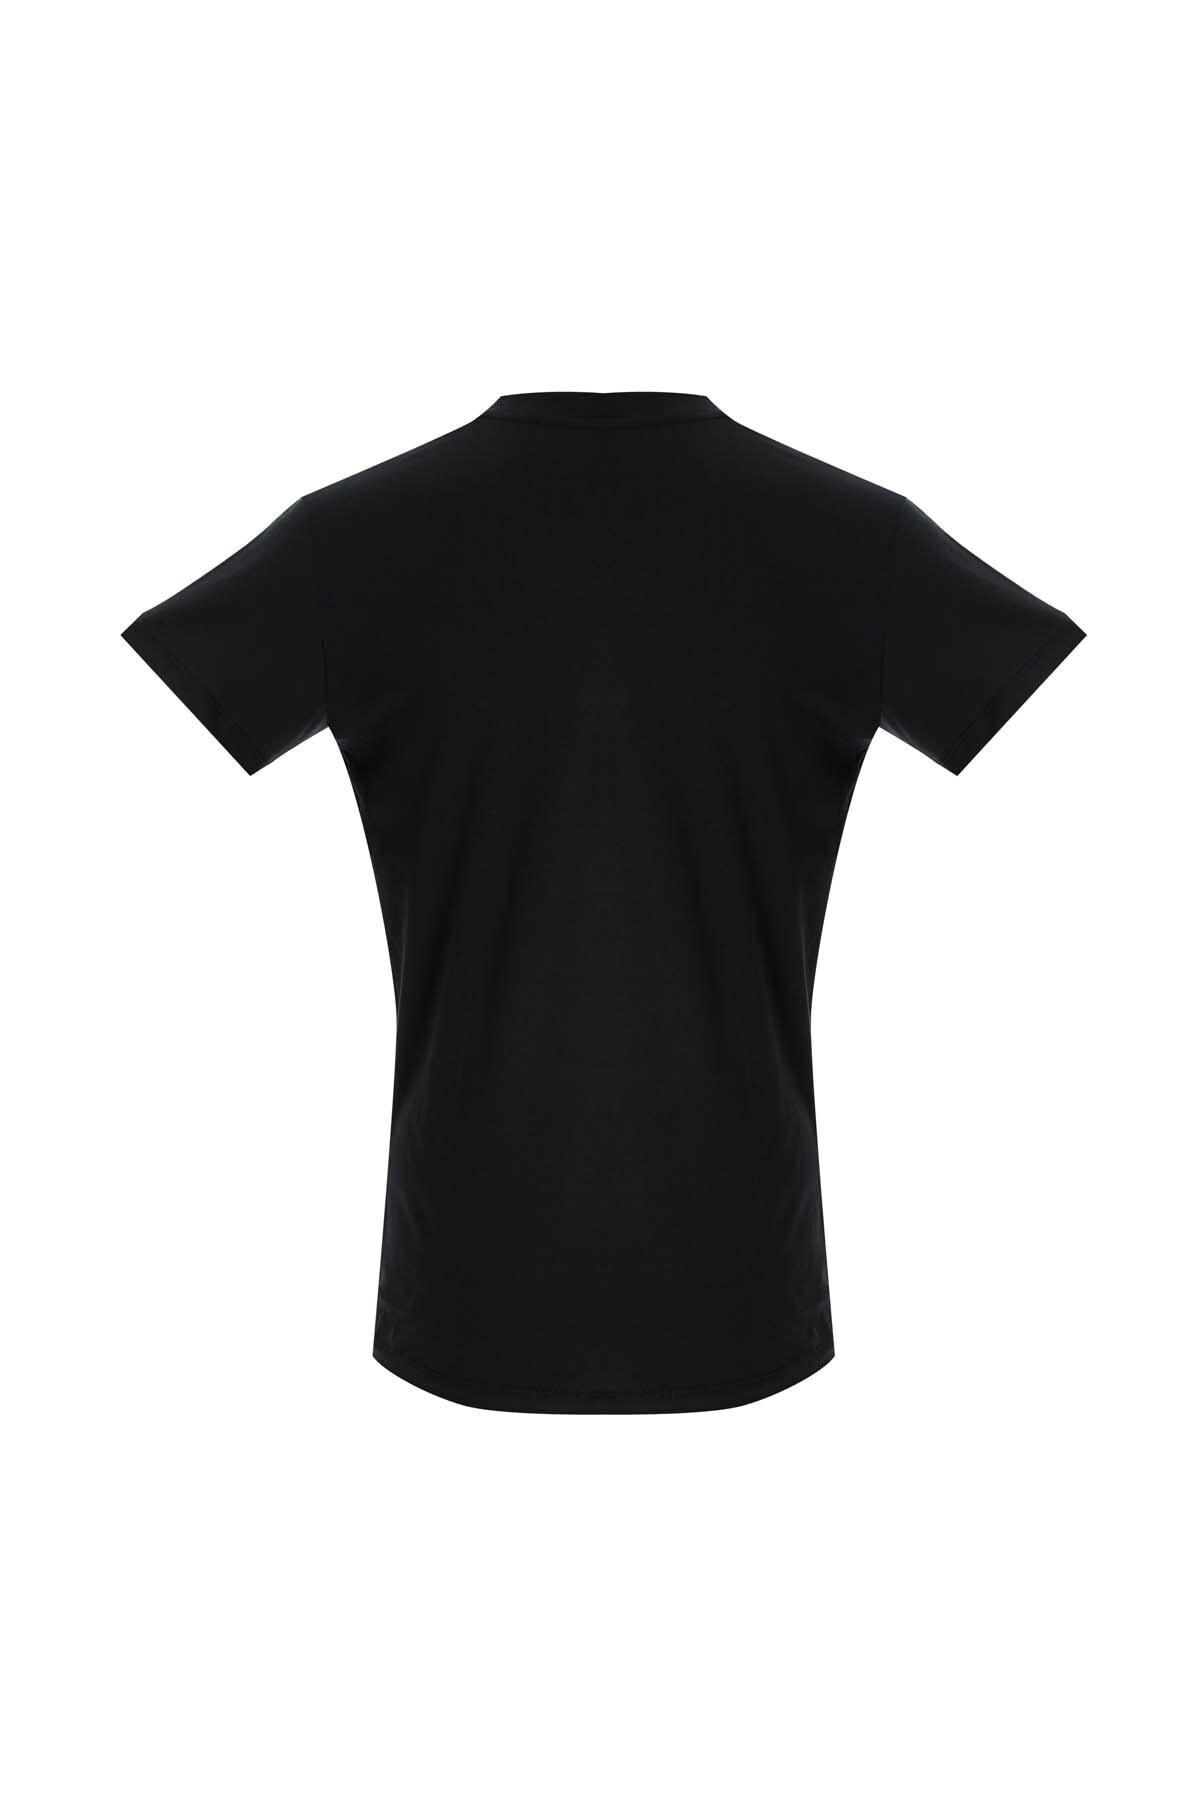 Gymlegend Erkek Süprem Kısa Kollu Tişört